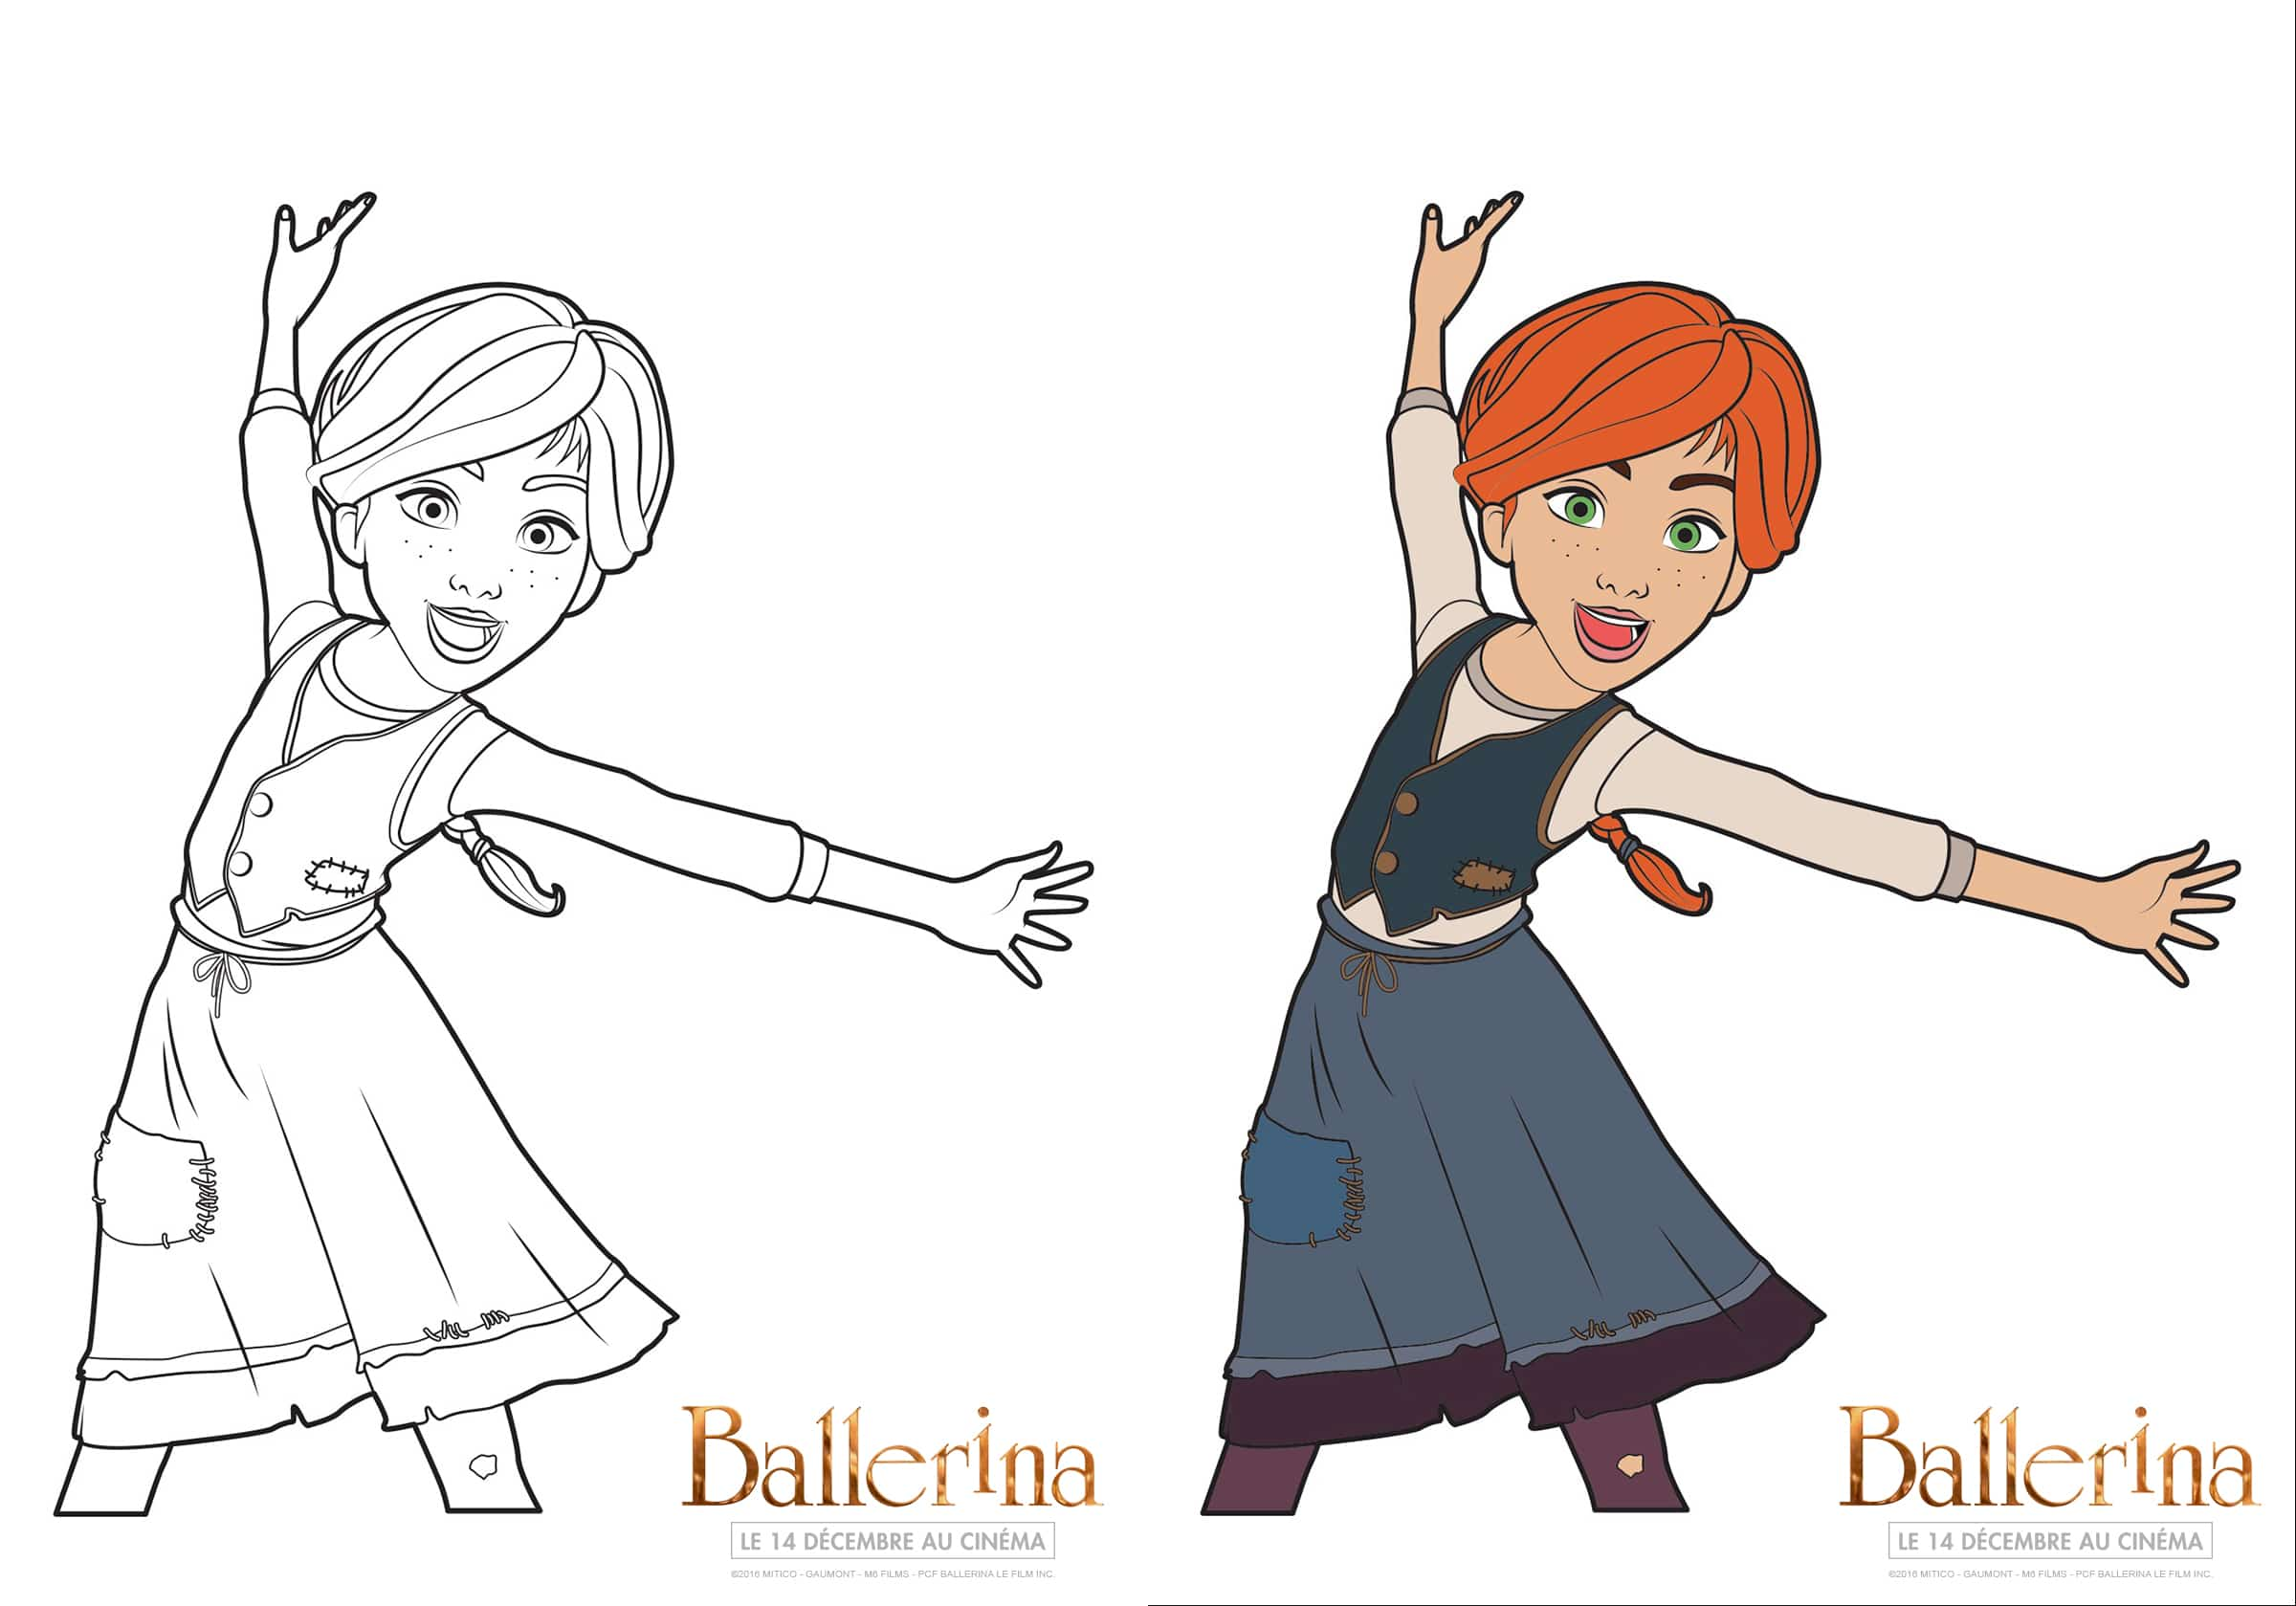 Coloriage Dessin Anime Ballerina.Luxe Coloriage Ballerina A Imprimer Imprimer Et Obtenir Une